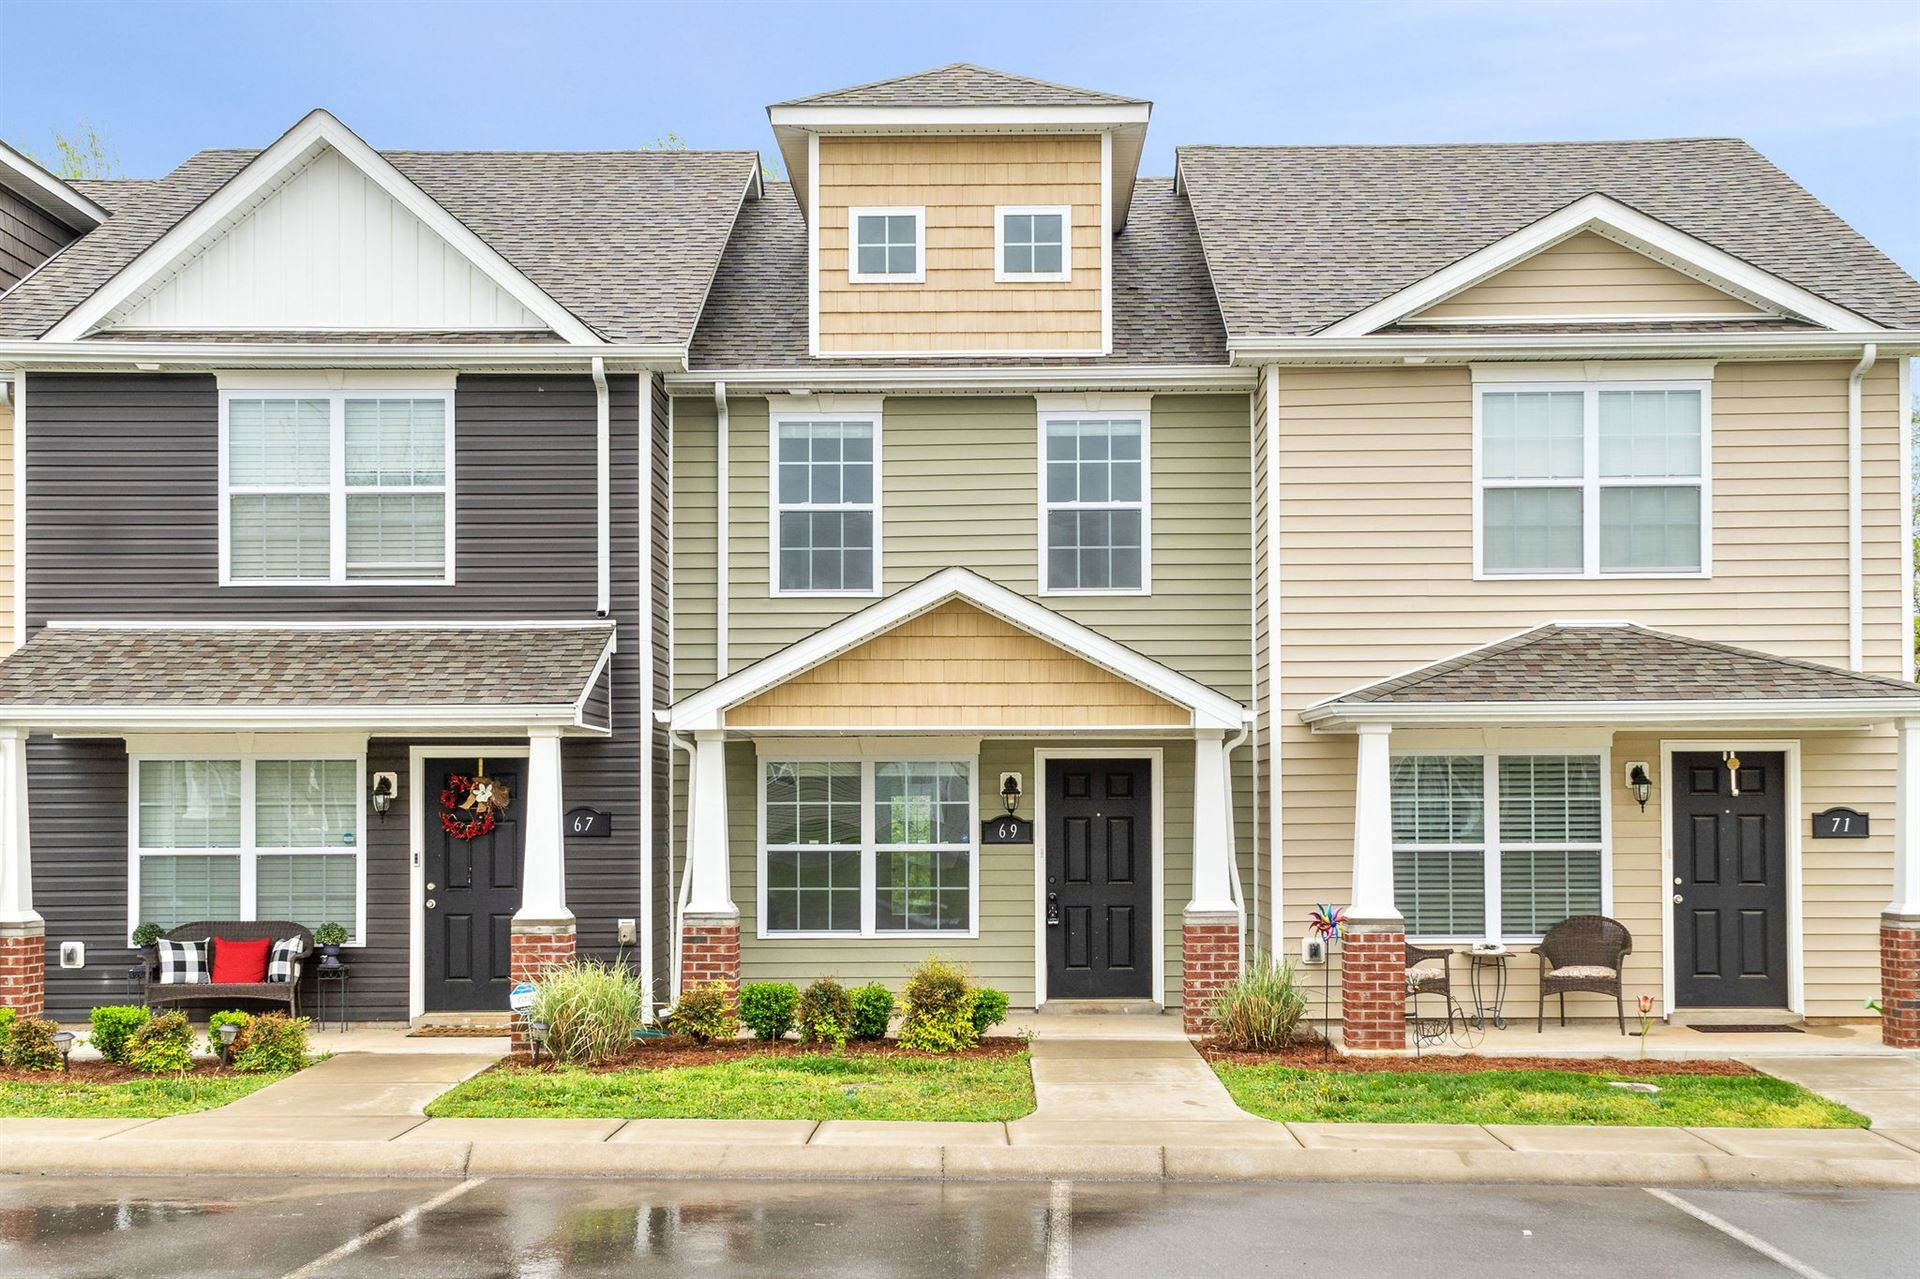 69 Ellington Ter, Clarksville, TN 37040 - MLS#: 2243038